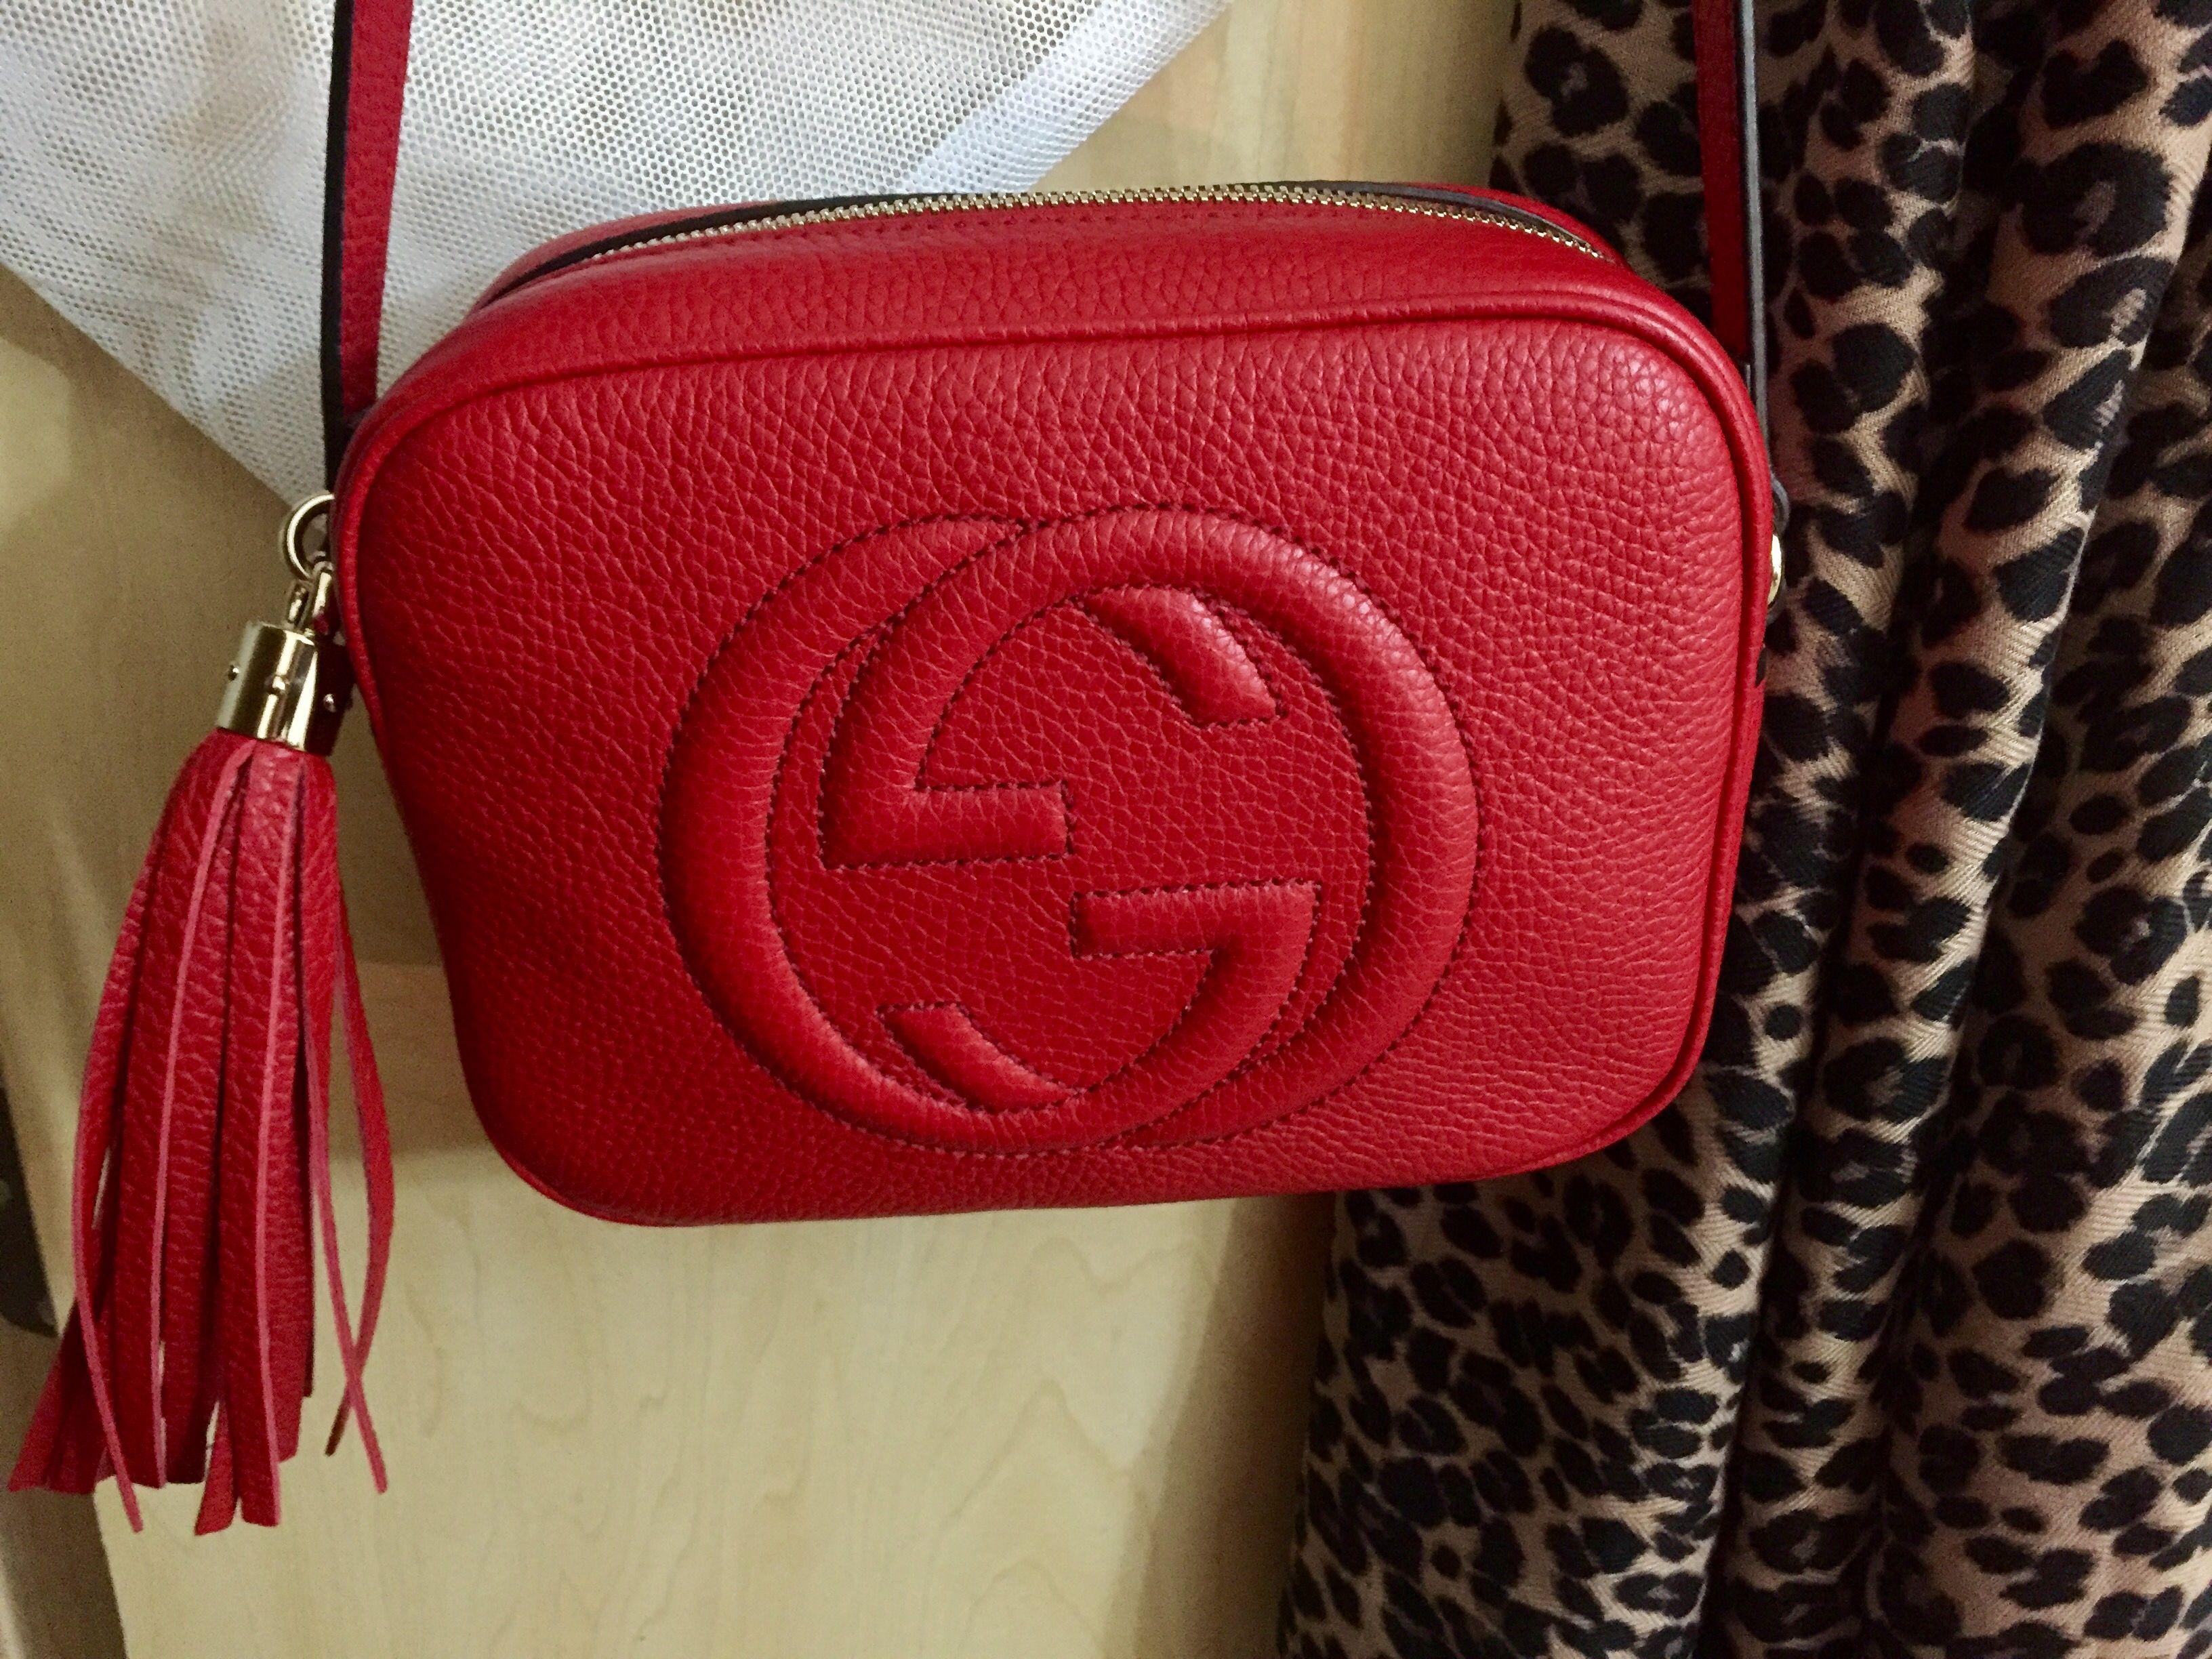 Gucci Soho Small Leather Disco Bag Soho Disco Bag Gucci Soho Bag Bags